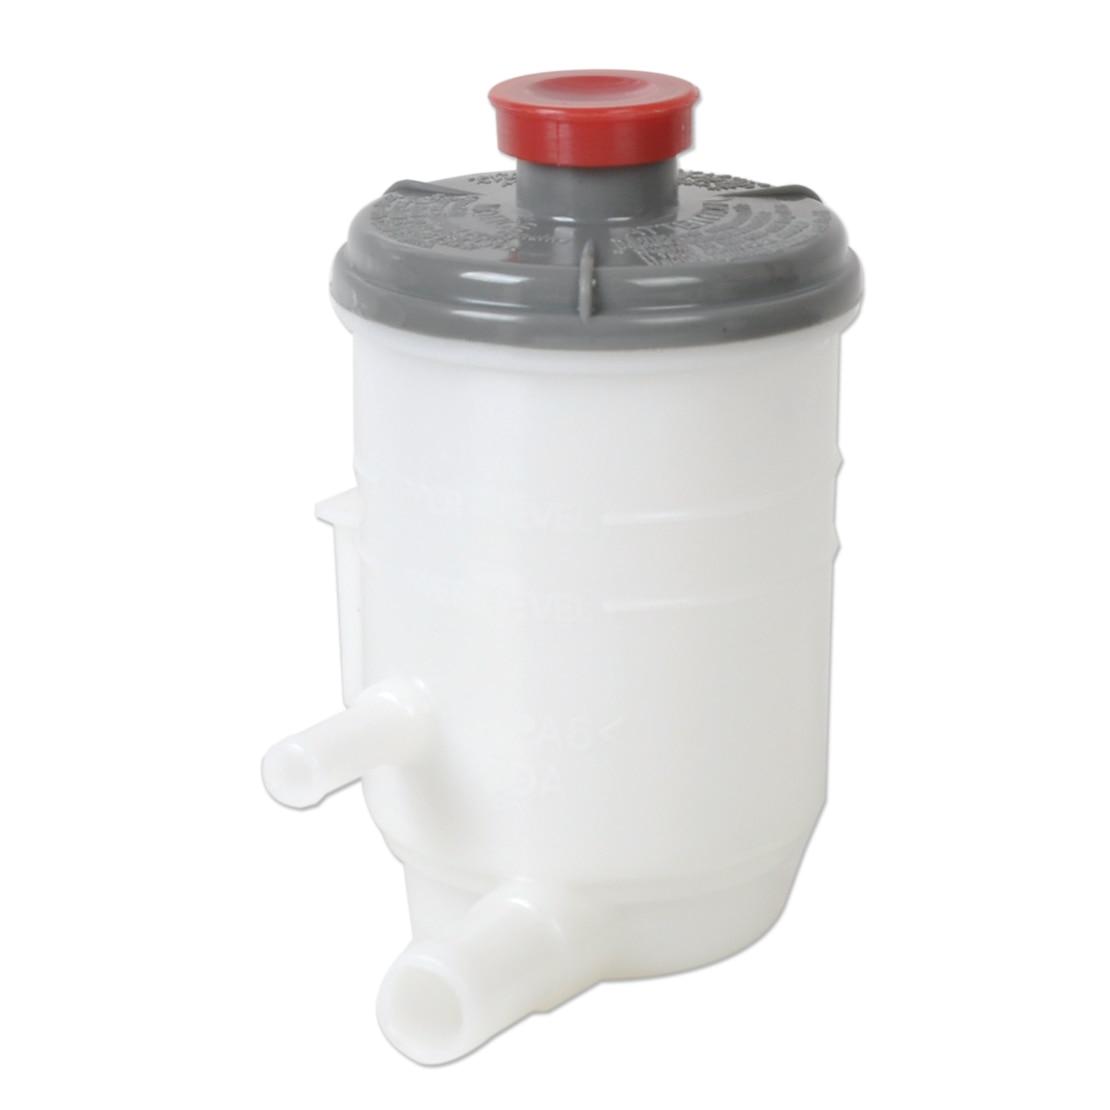 DWCX New Car Power Steering Pump Fluid Reservoir Tank